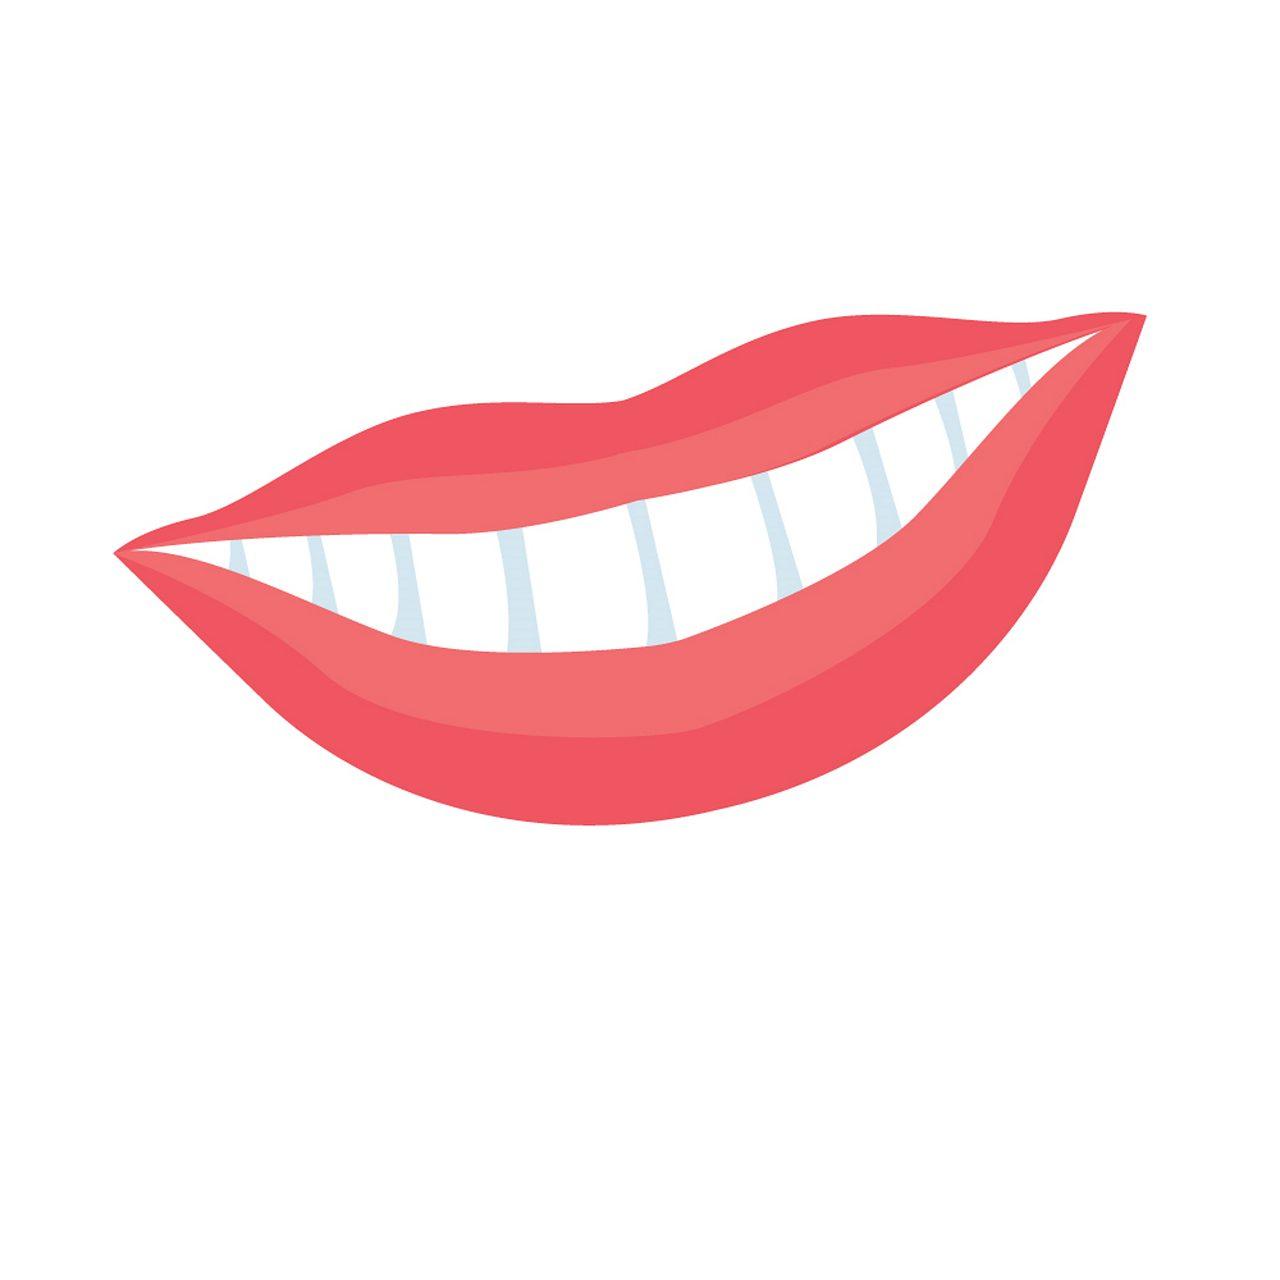 Schrijver M tandarts onder narcose